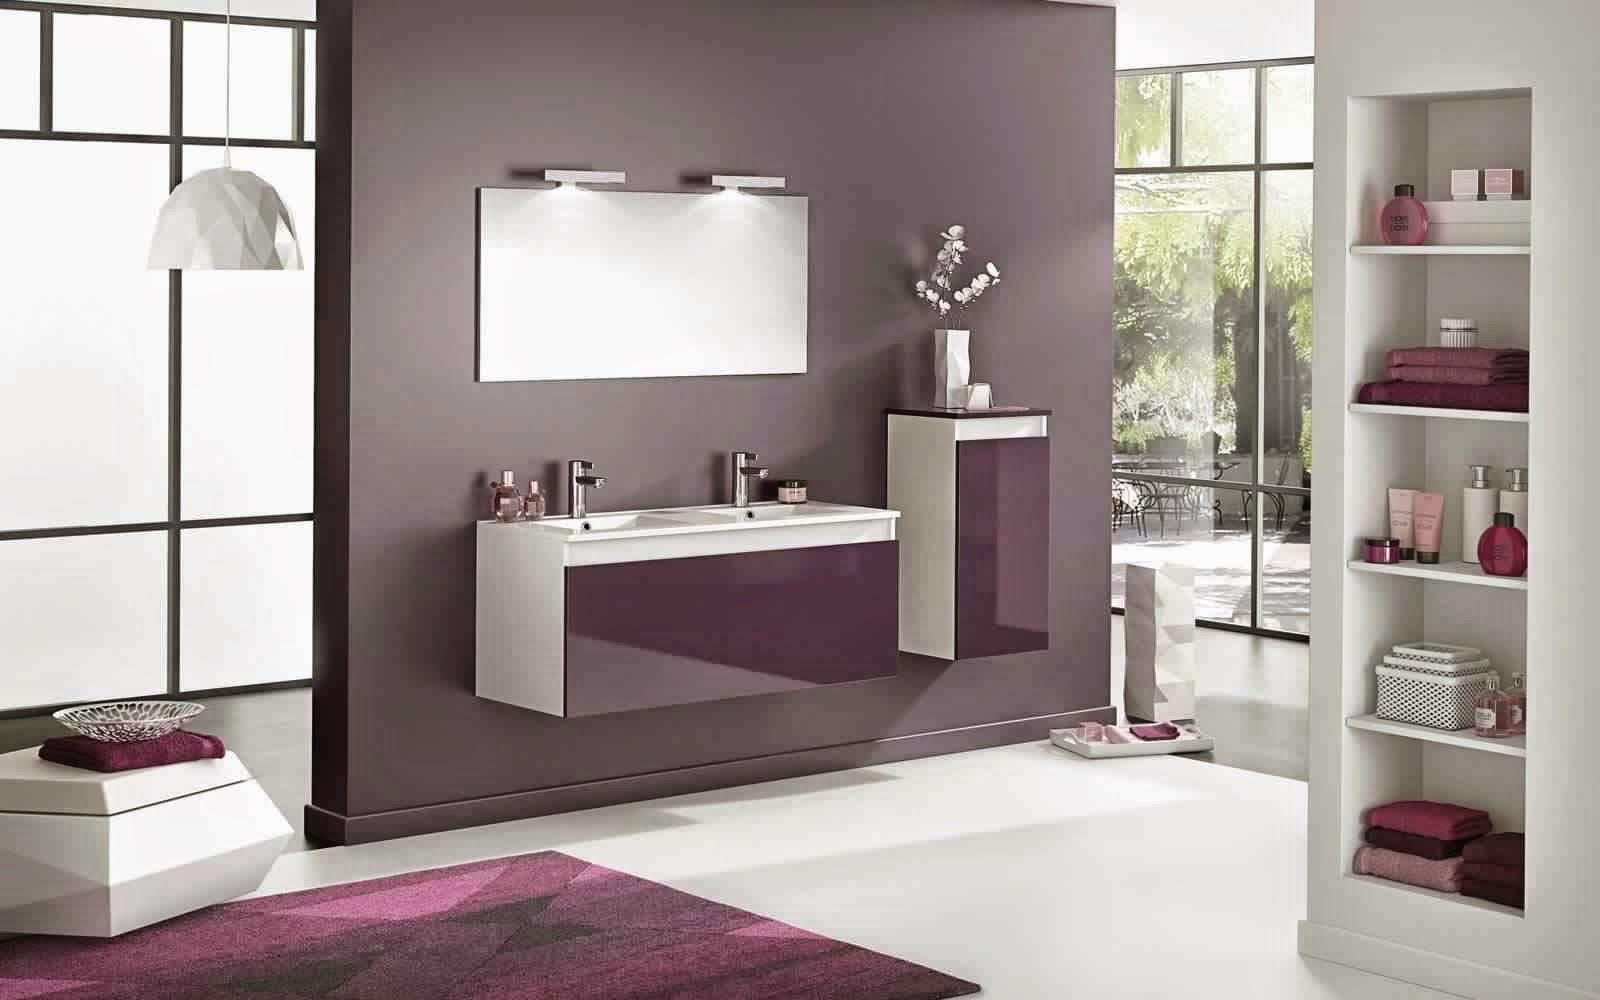 Meubles de salle de bain meuble d coration maison for But meuble salle de bain